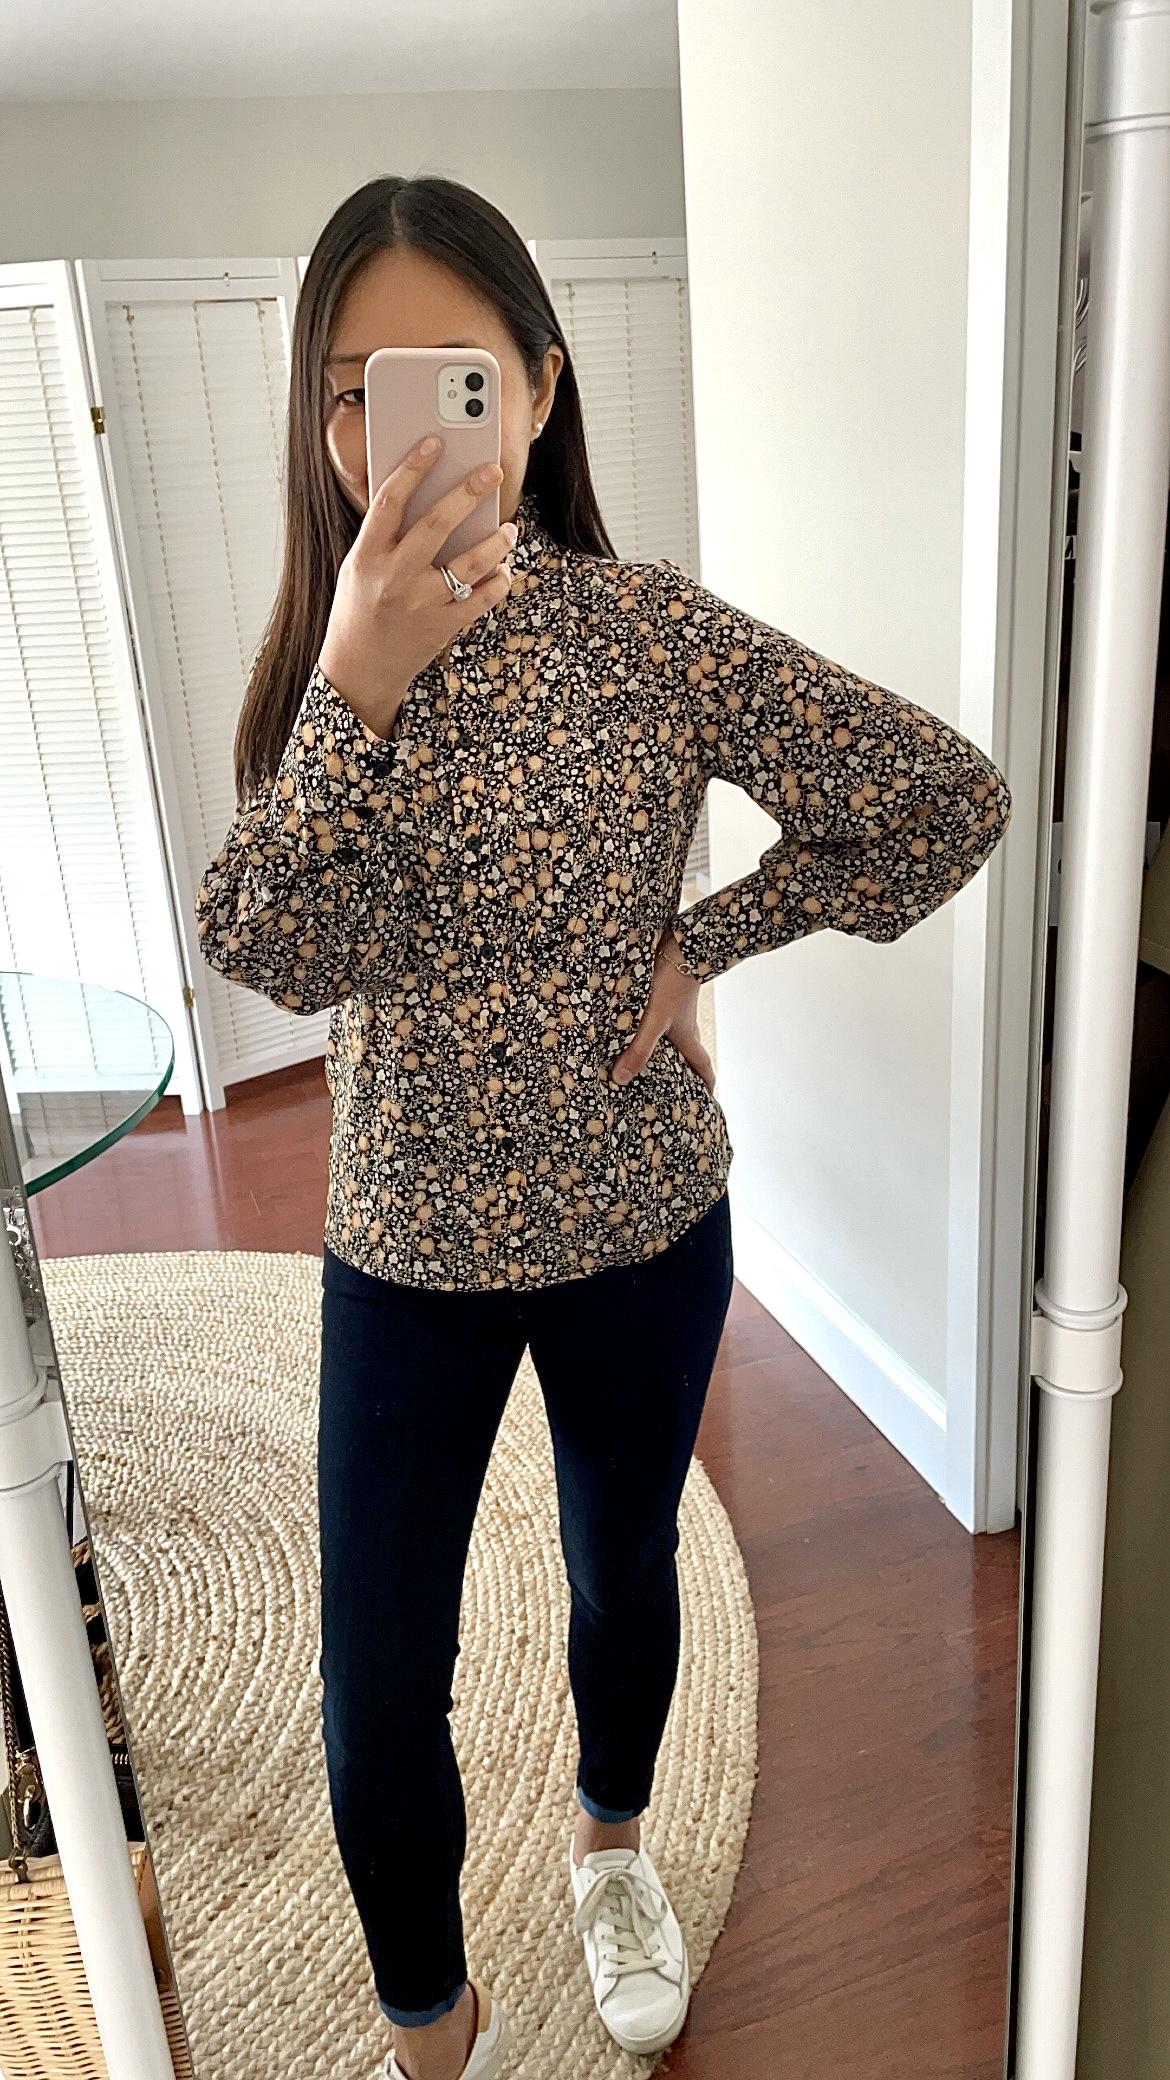 Nili Lotan x Target Women's Floral Print Long Sleeve Pleated Blouse, size XXS